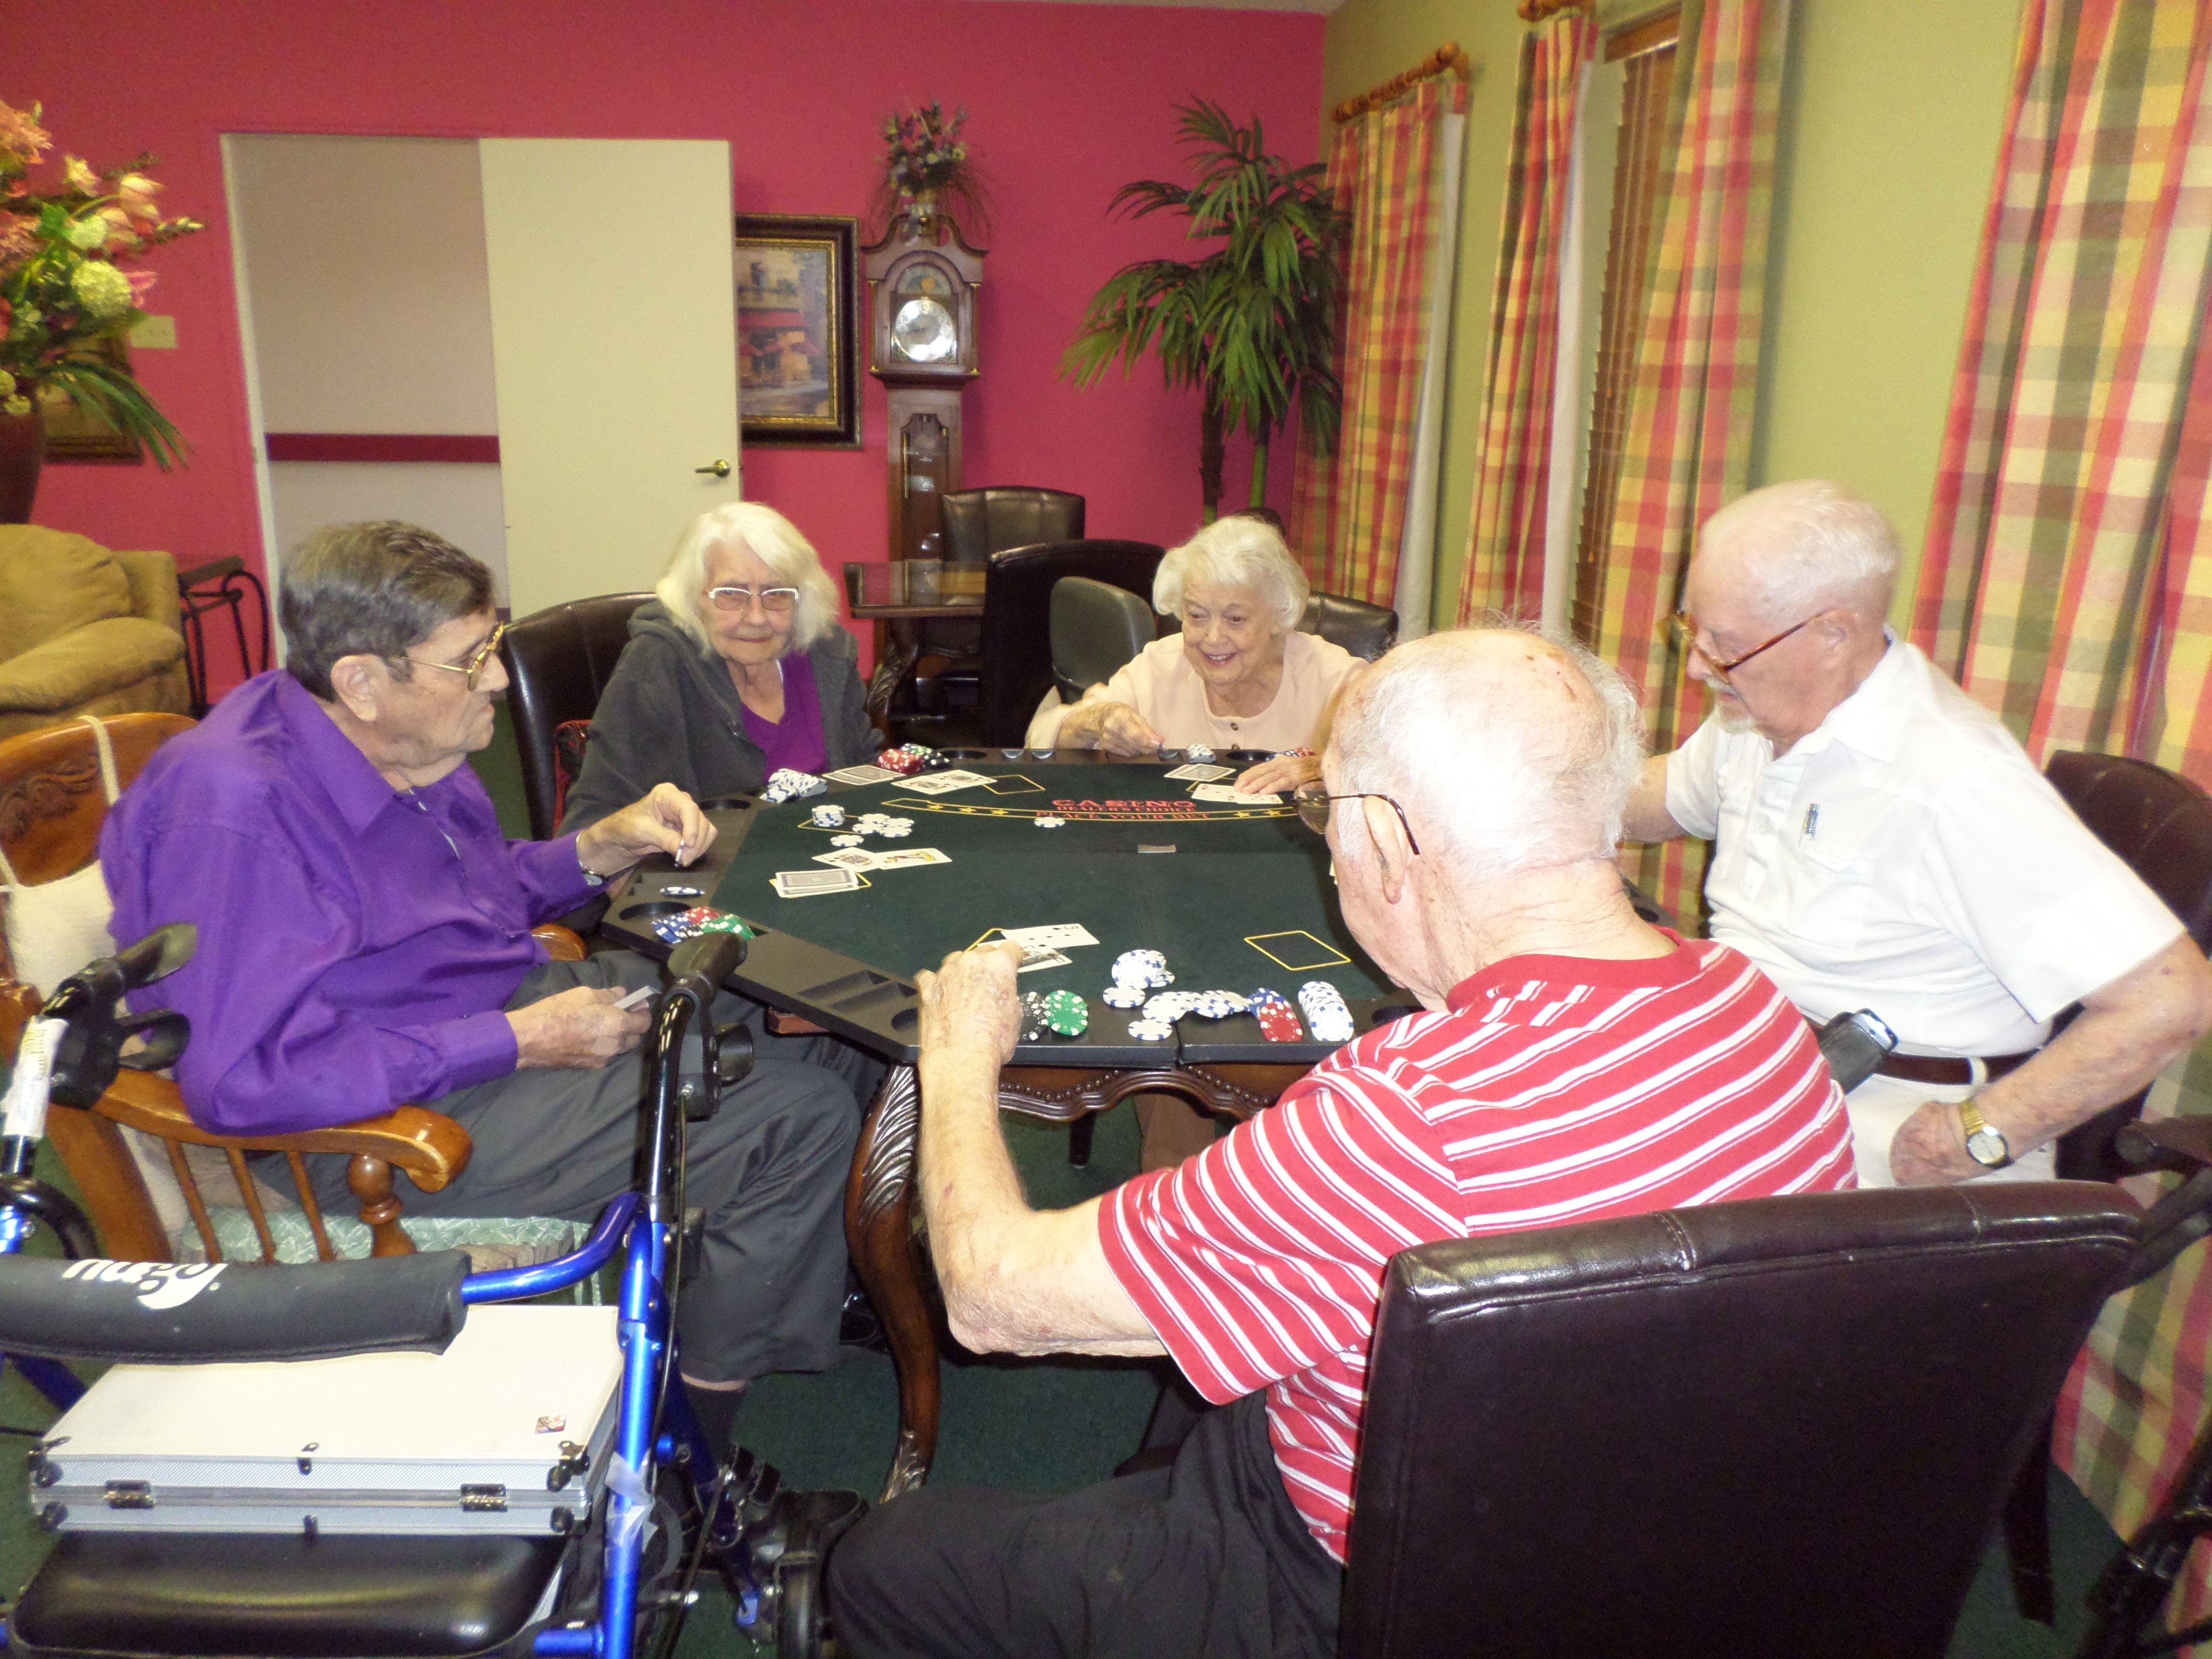 Poker with friends Tom Trimble, Dorothy Green, Violet Ingram, Victor Hetzel and Andy Kohn!